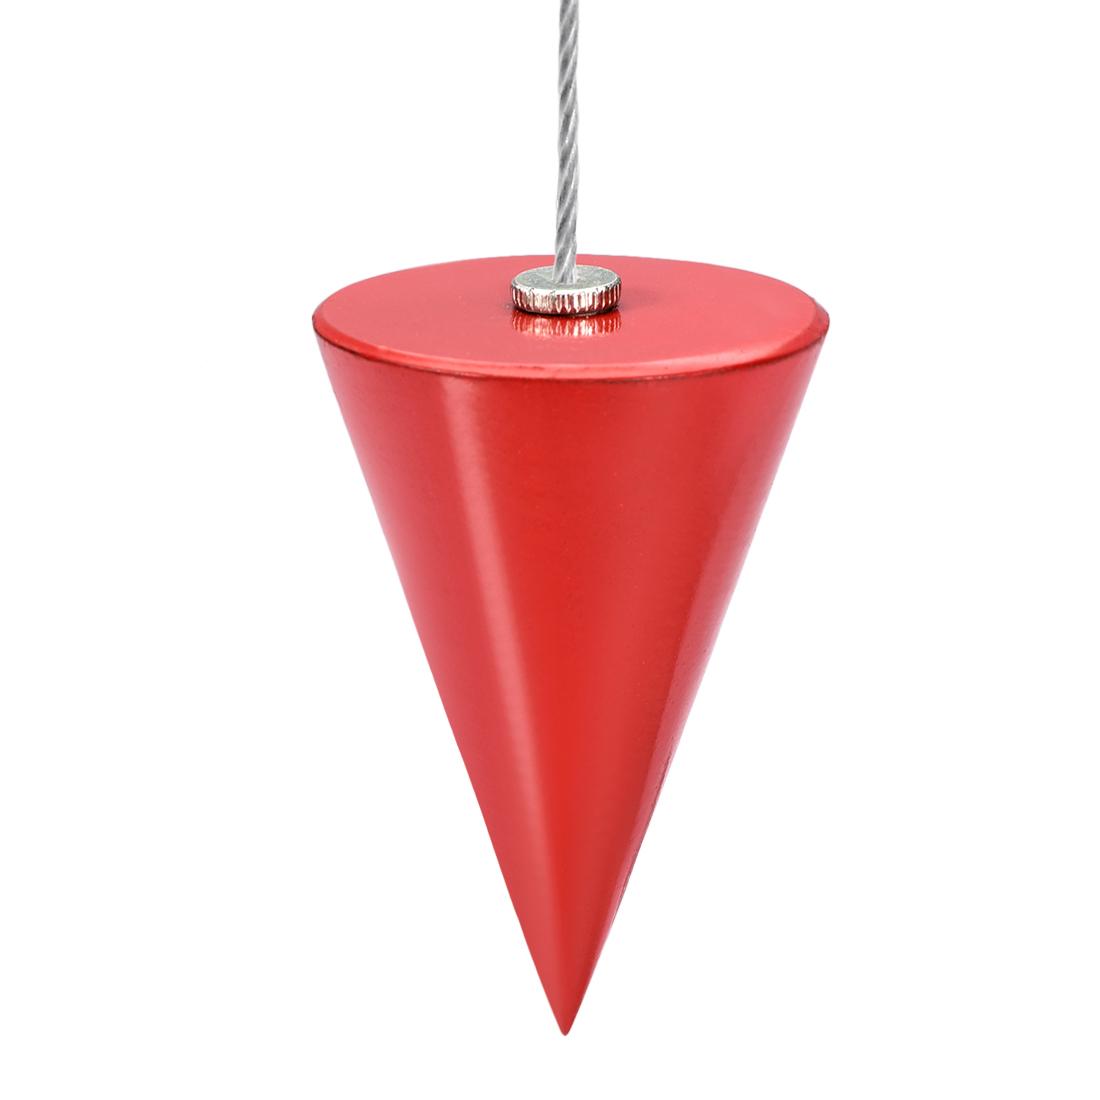 Plumb with String Line 3.7m 500g Hammer Apeak Linear Level Masonry Measure Tool